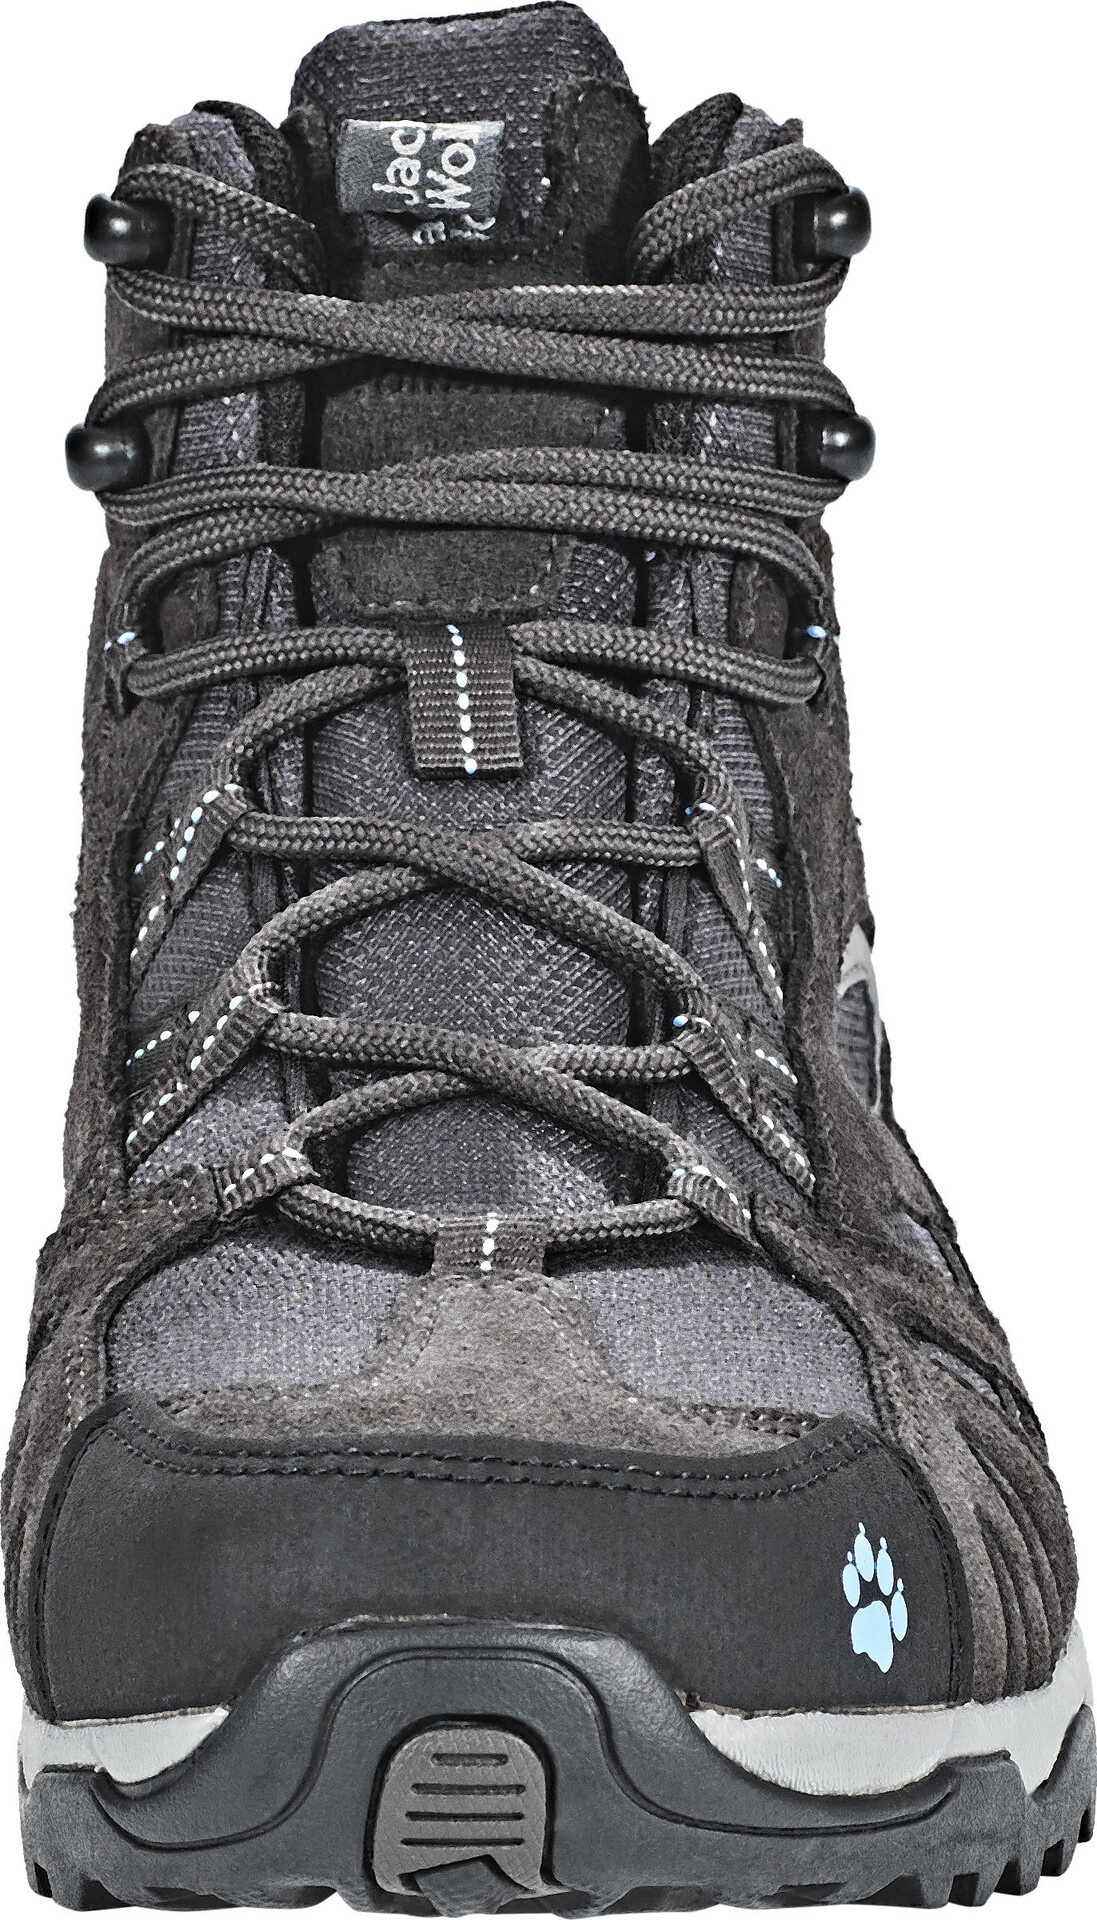 Sur Vojo Gris Texapore Femme Chaussures Jack Mid Wolfskin Hike q5fFO